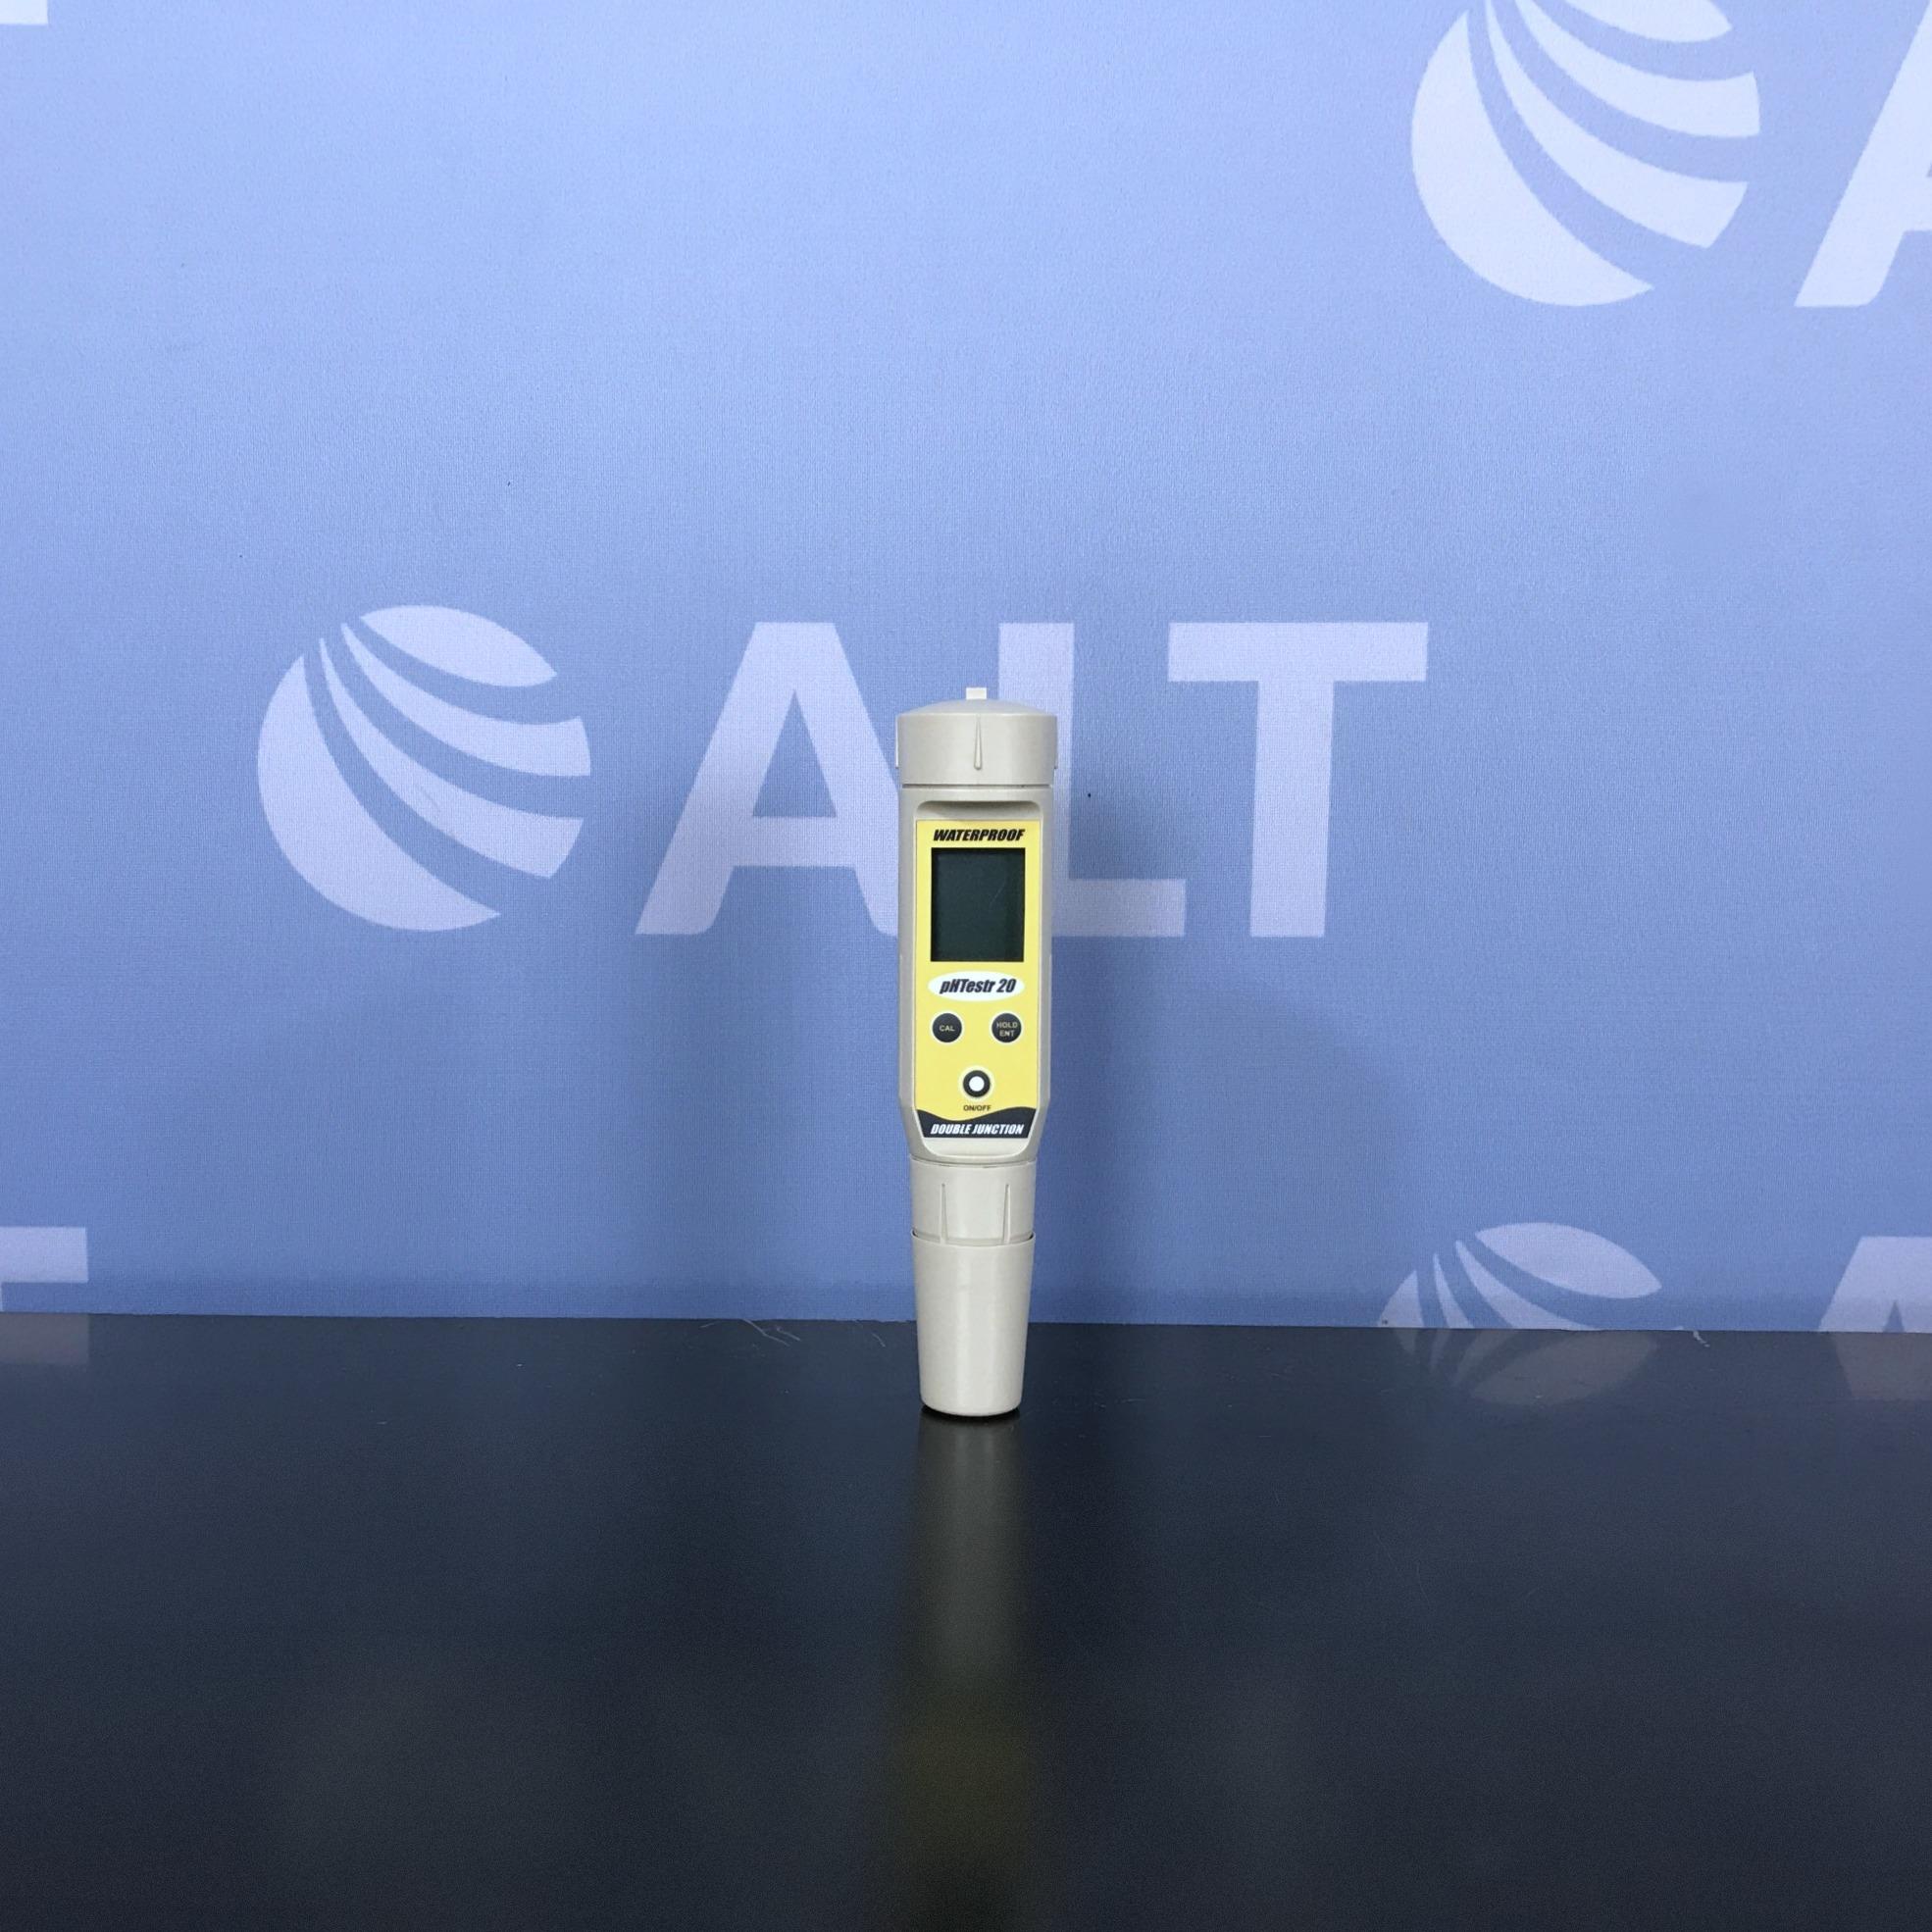 Oakton Waterproof pHTestr 20 Pocket Tester Image